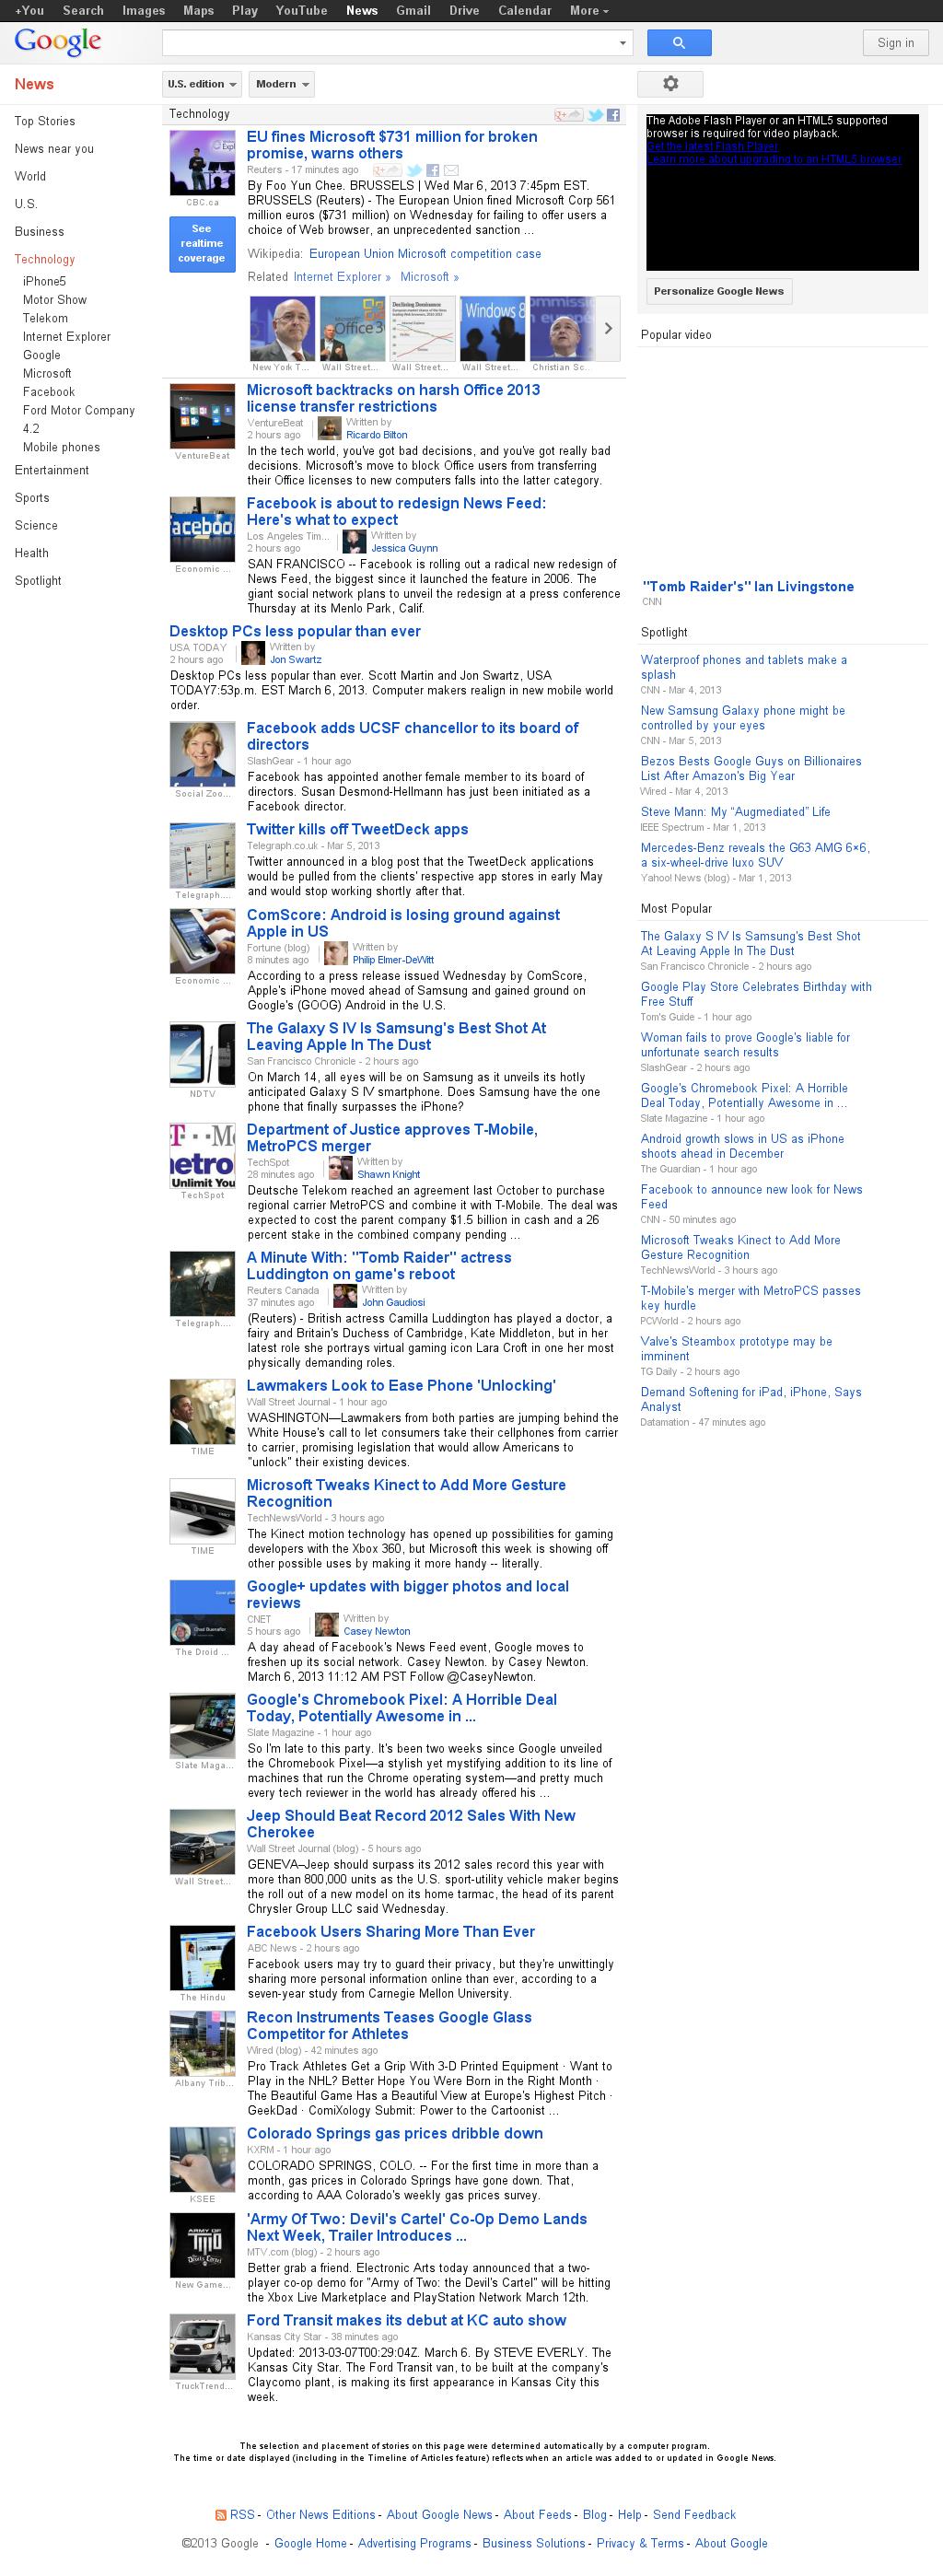 Google News: Technology at Thursday March 7, 2013, 1:08 a.m. UTC